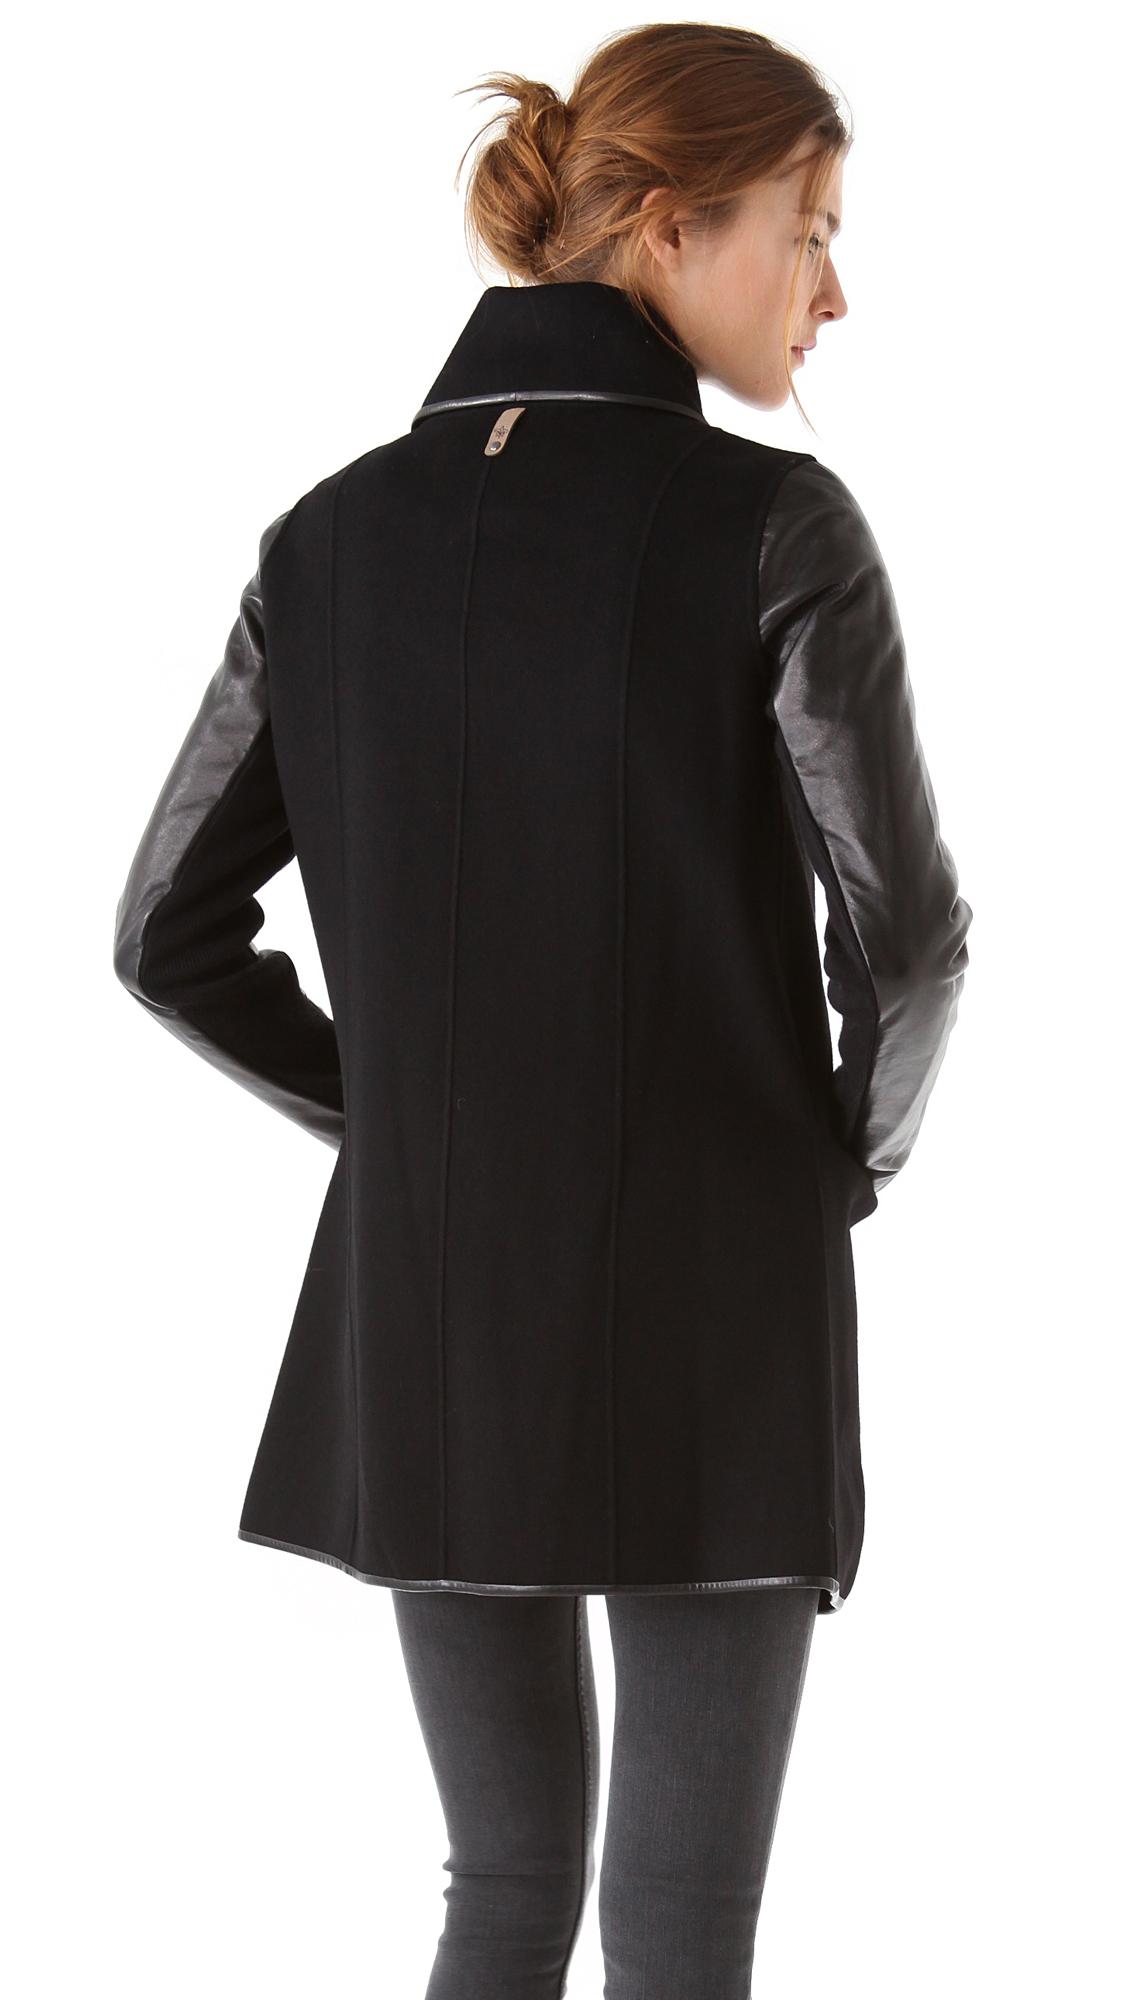 f44458baa4c Mackage Wool Coat with Leather Sleeves